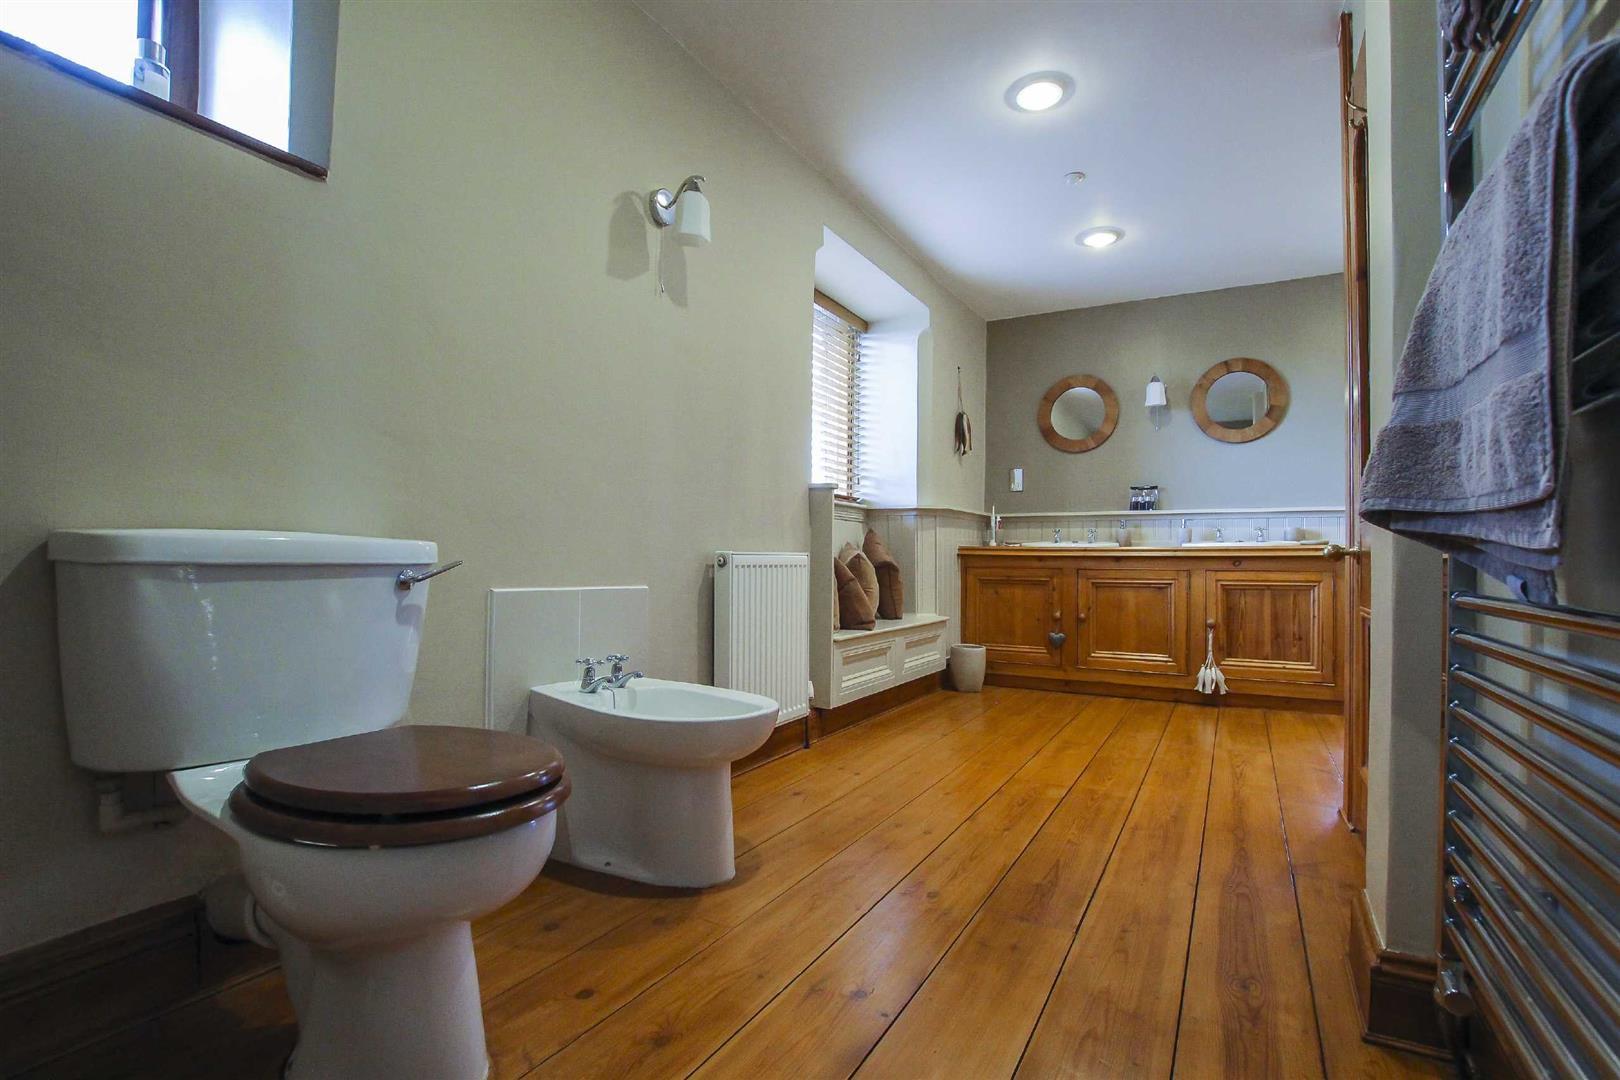 5 Bedroom Barn Conversion For Sale - p026519_17.jpg